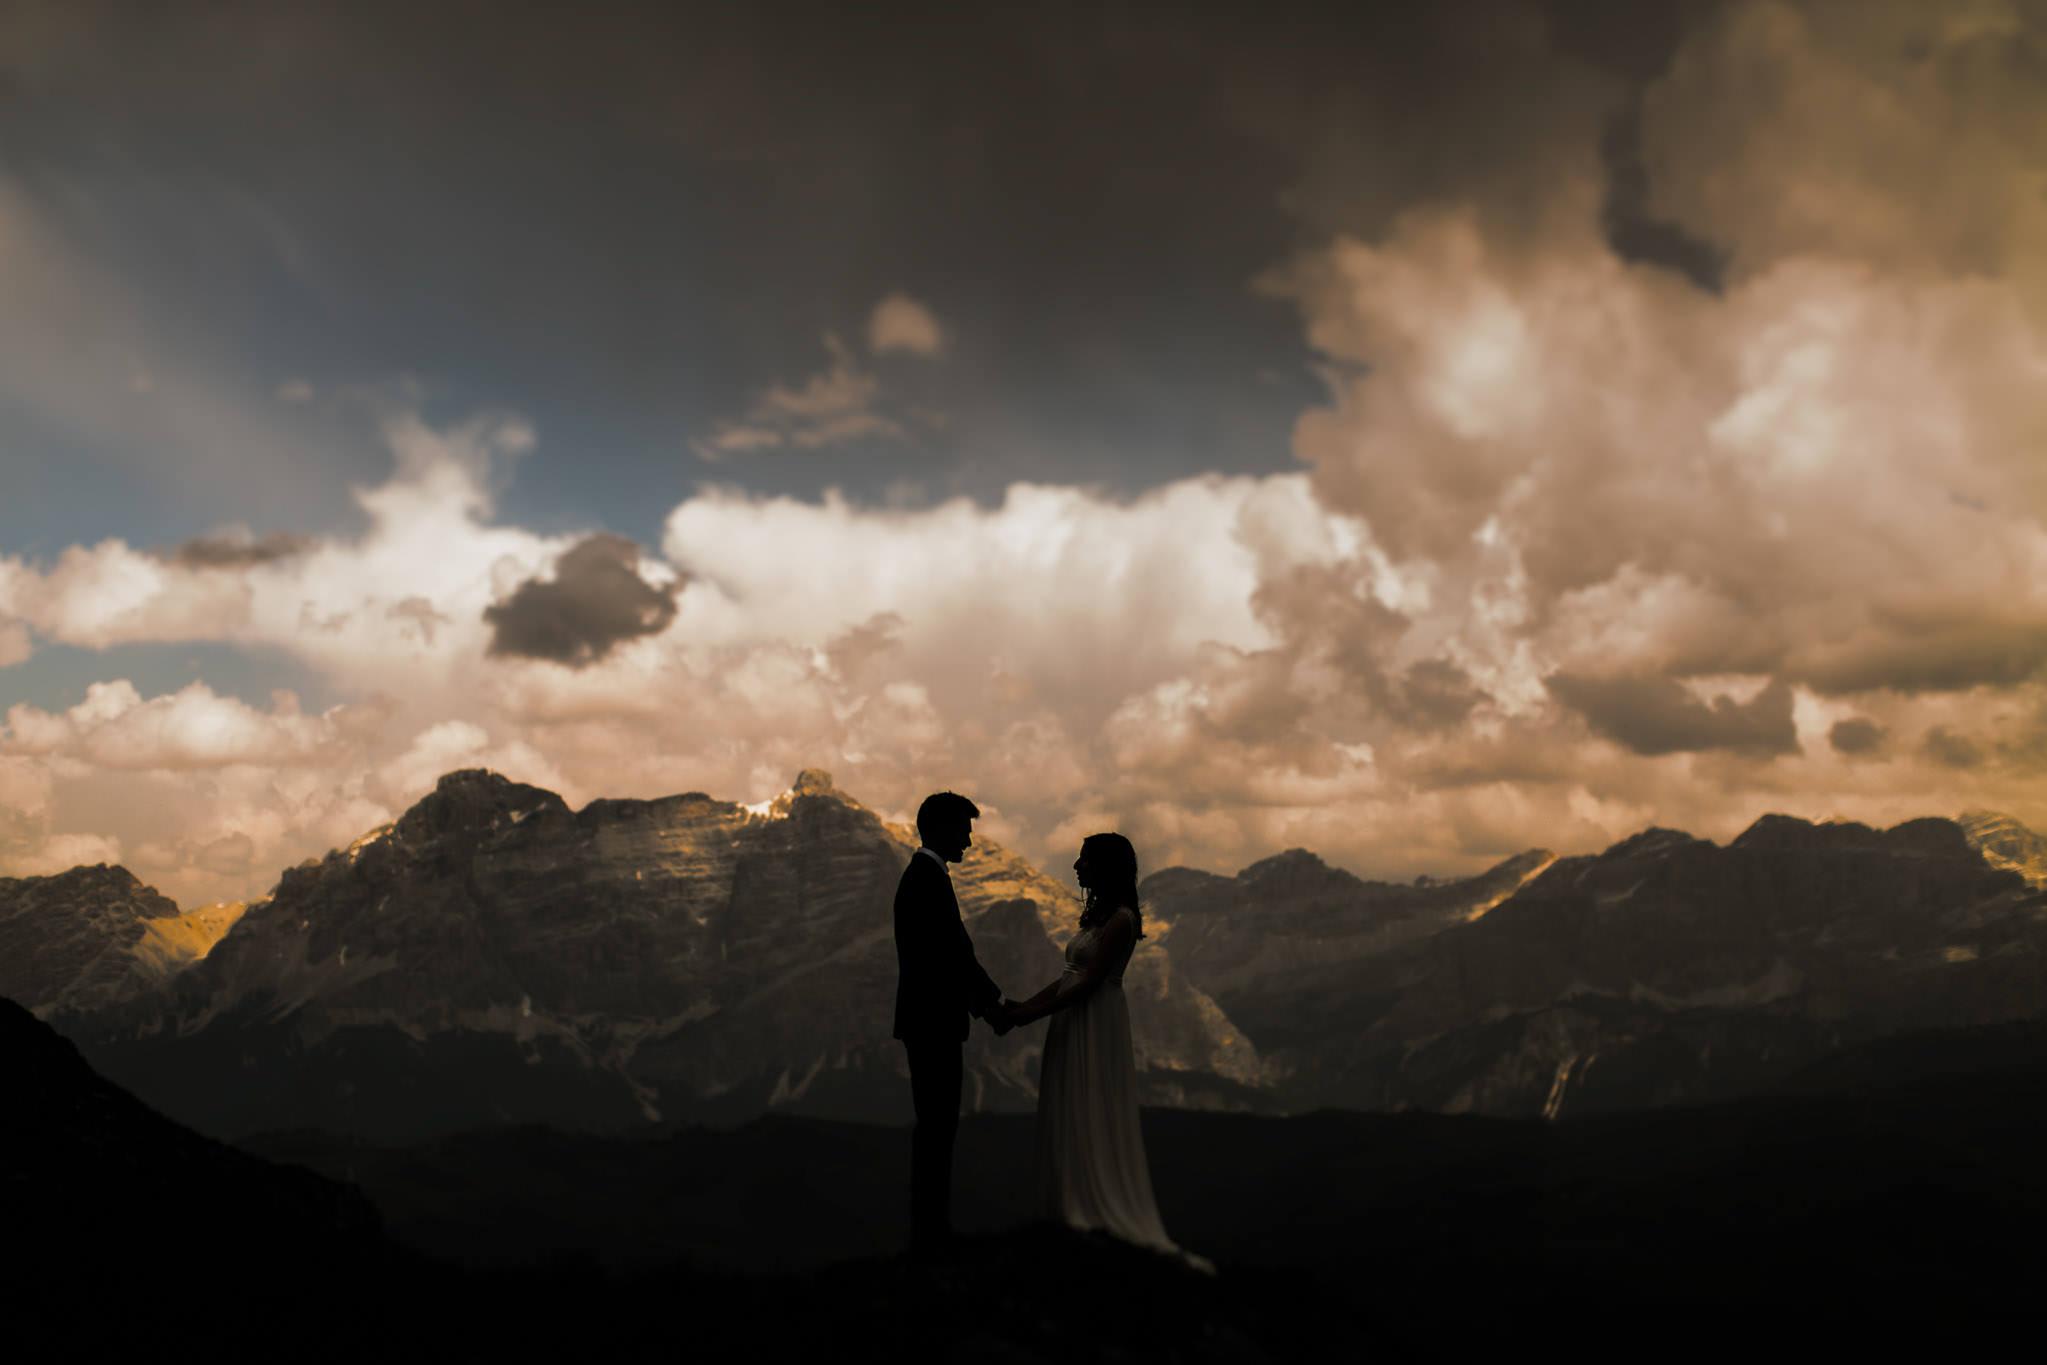 fotografia_di_matrimonio_portfolio-1007